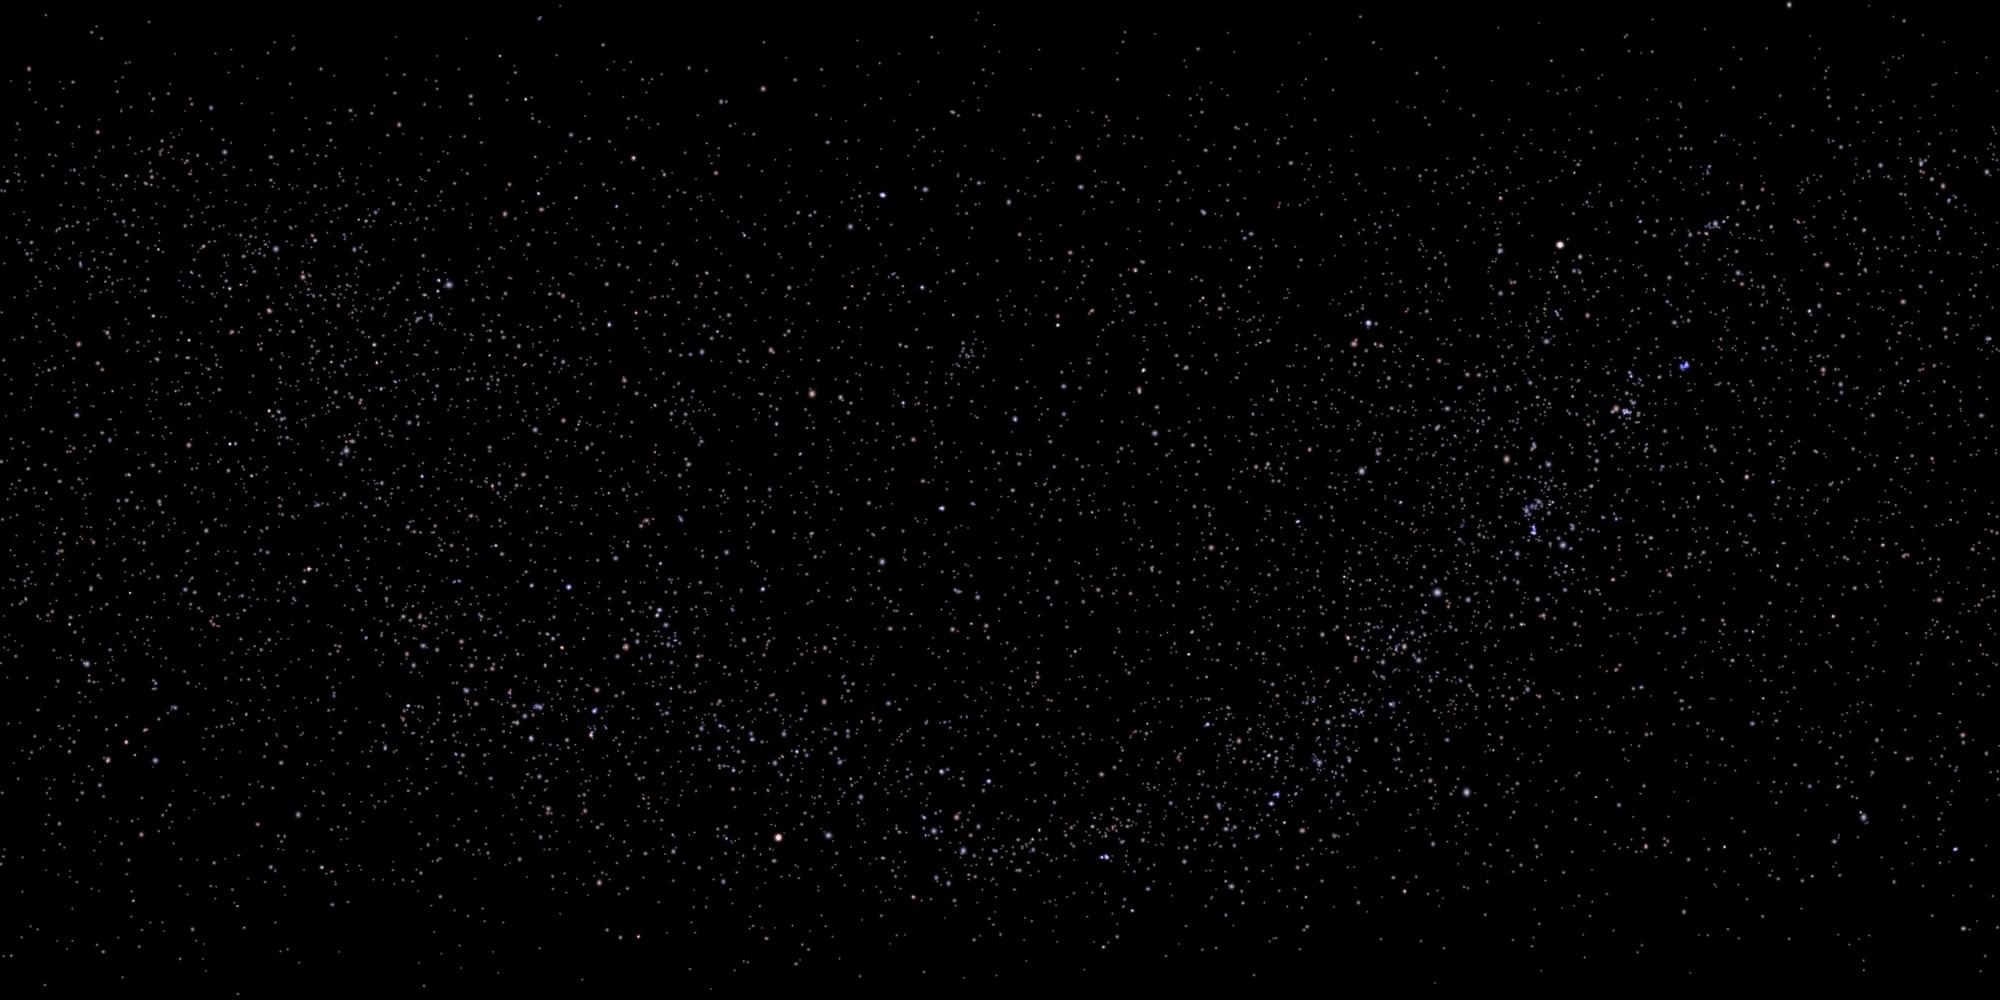 star_field_visible_eqt.jpg